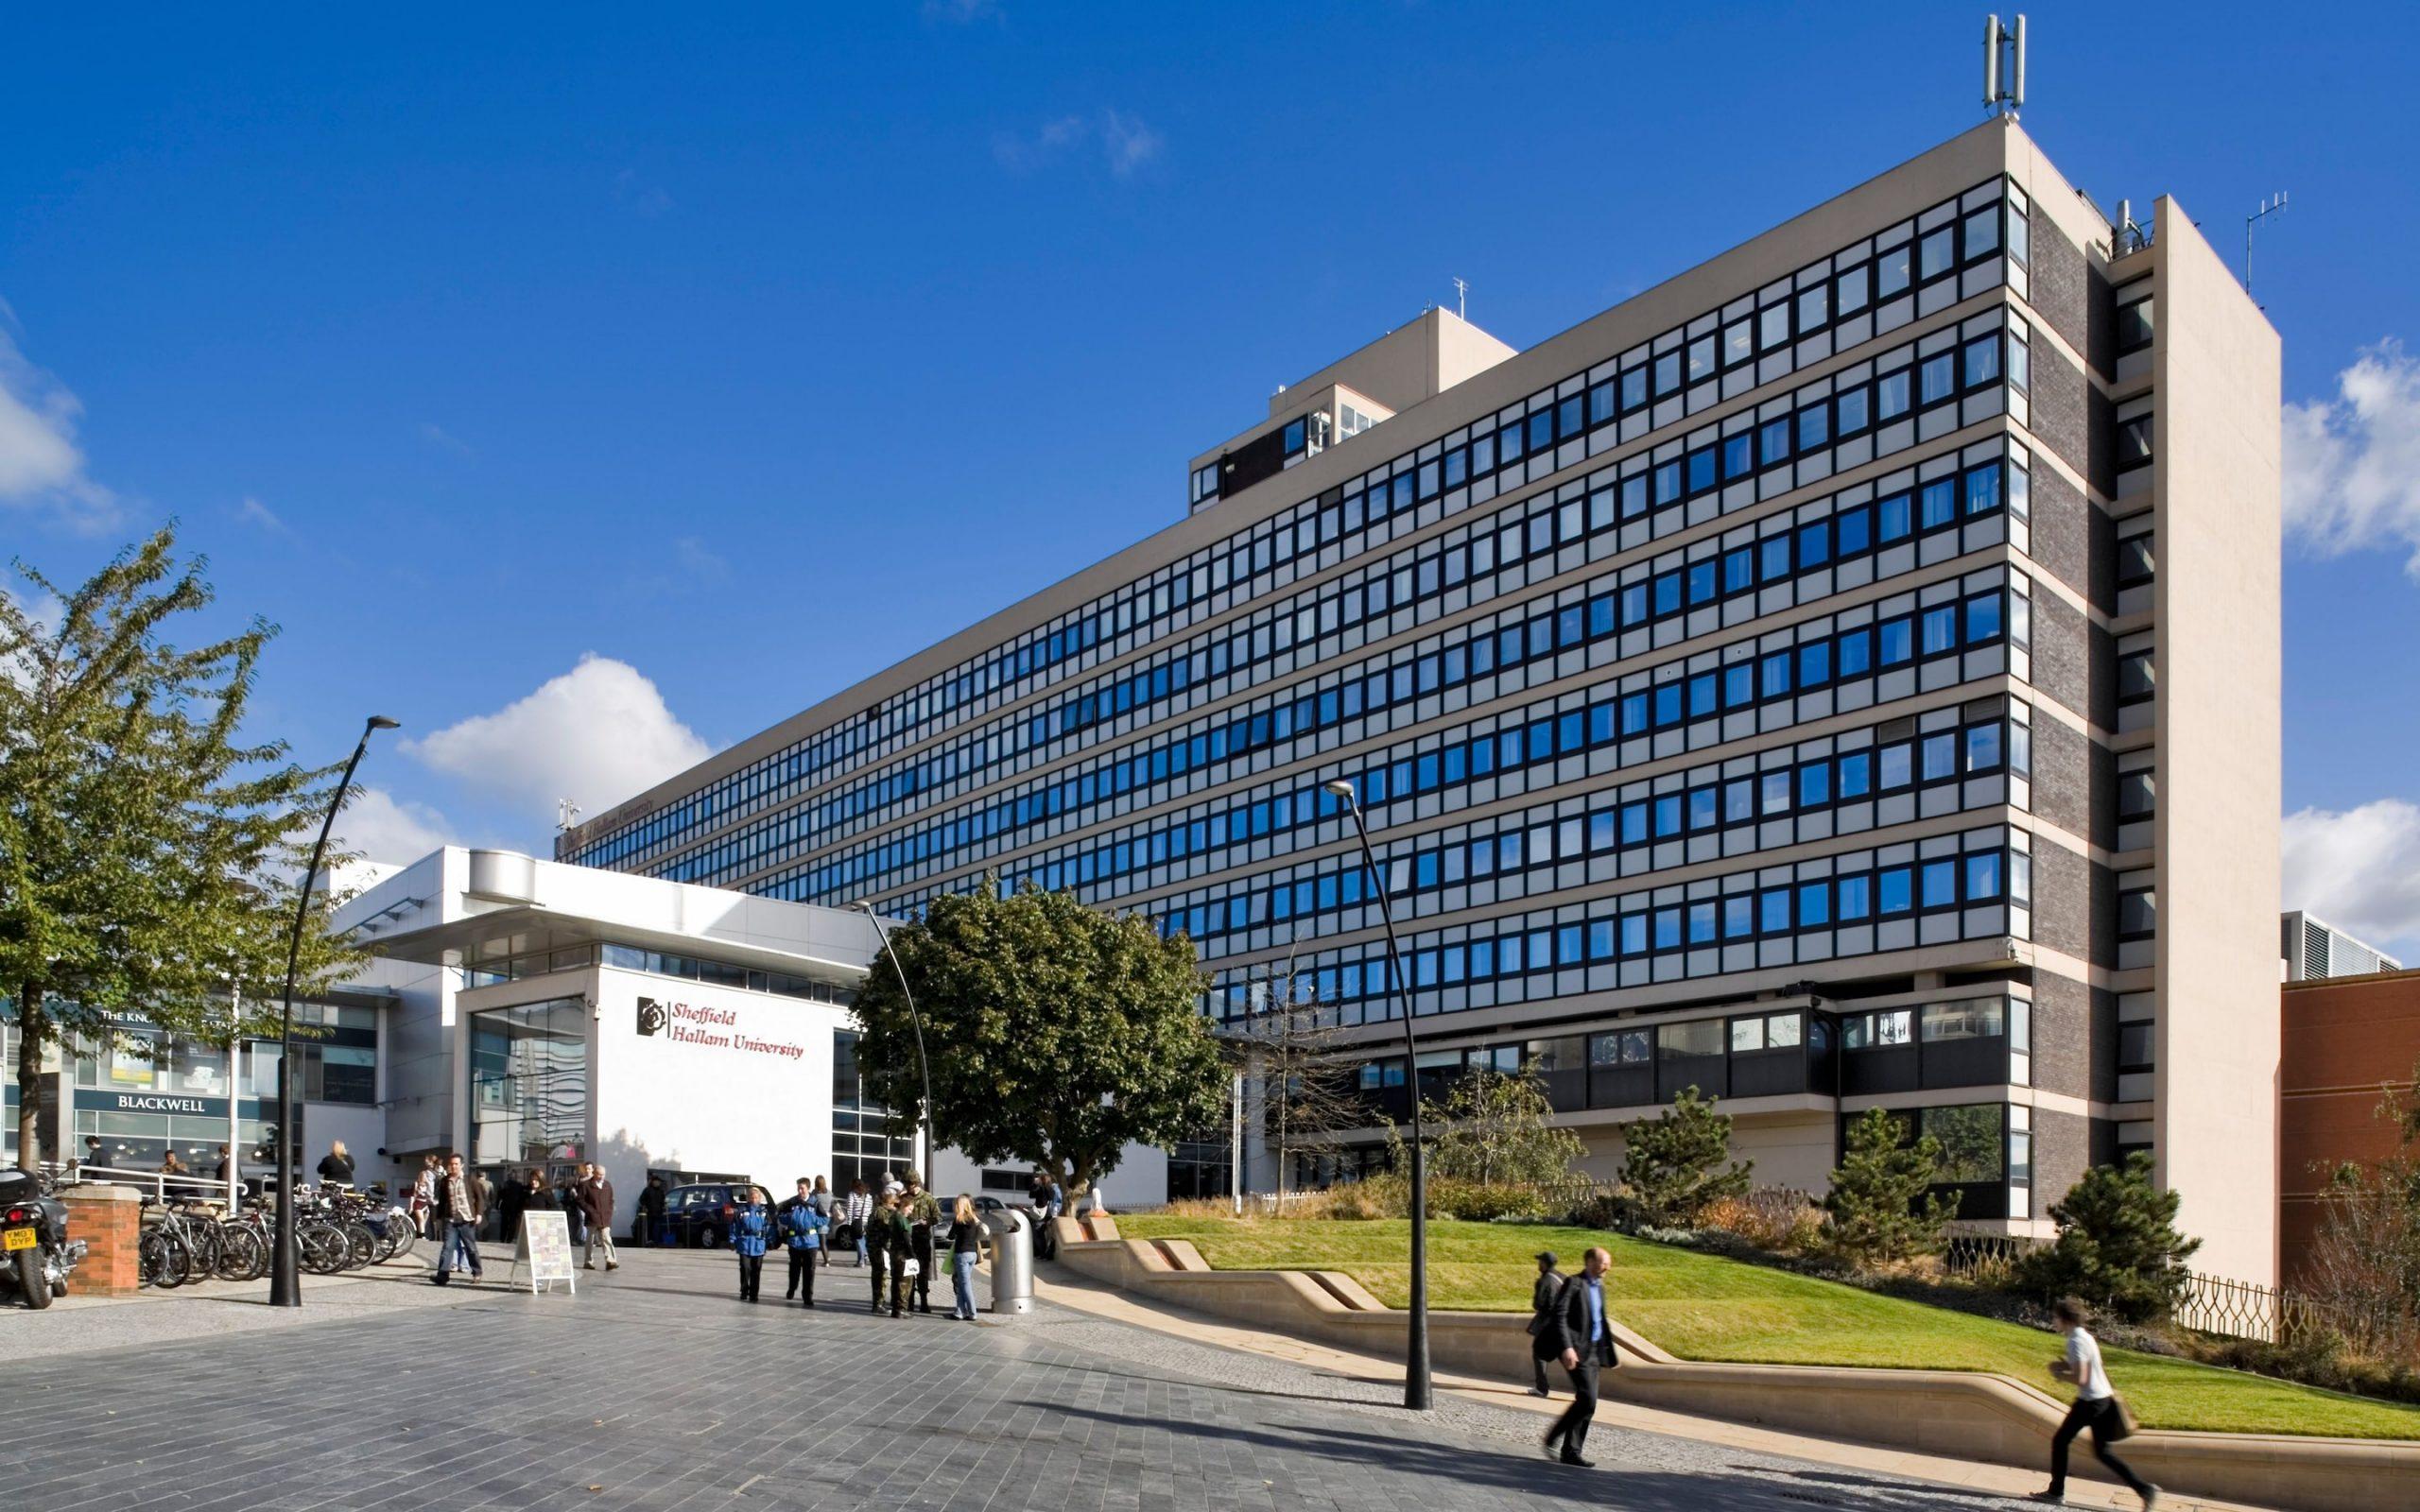 Beasiswa Sheffield Hallam University Program S1 dan S2, Deadline 31 Mei 2021